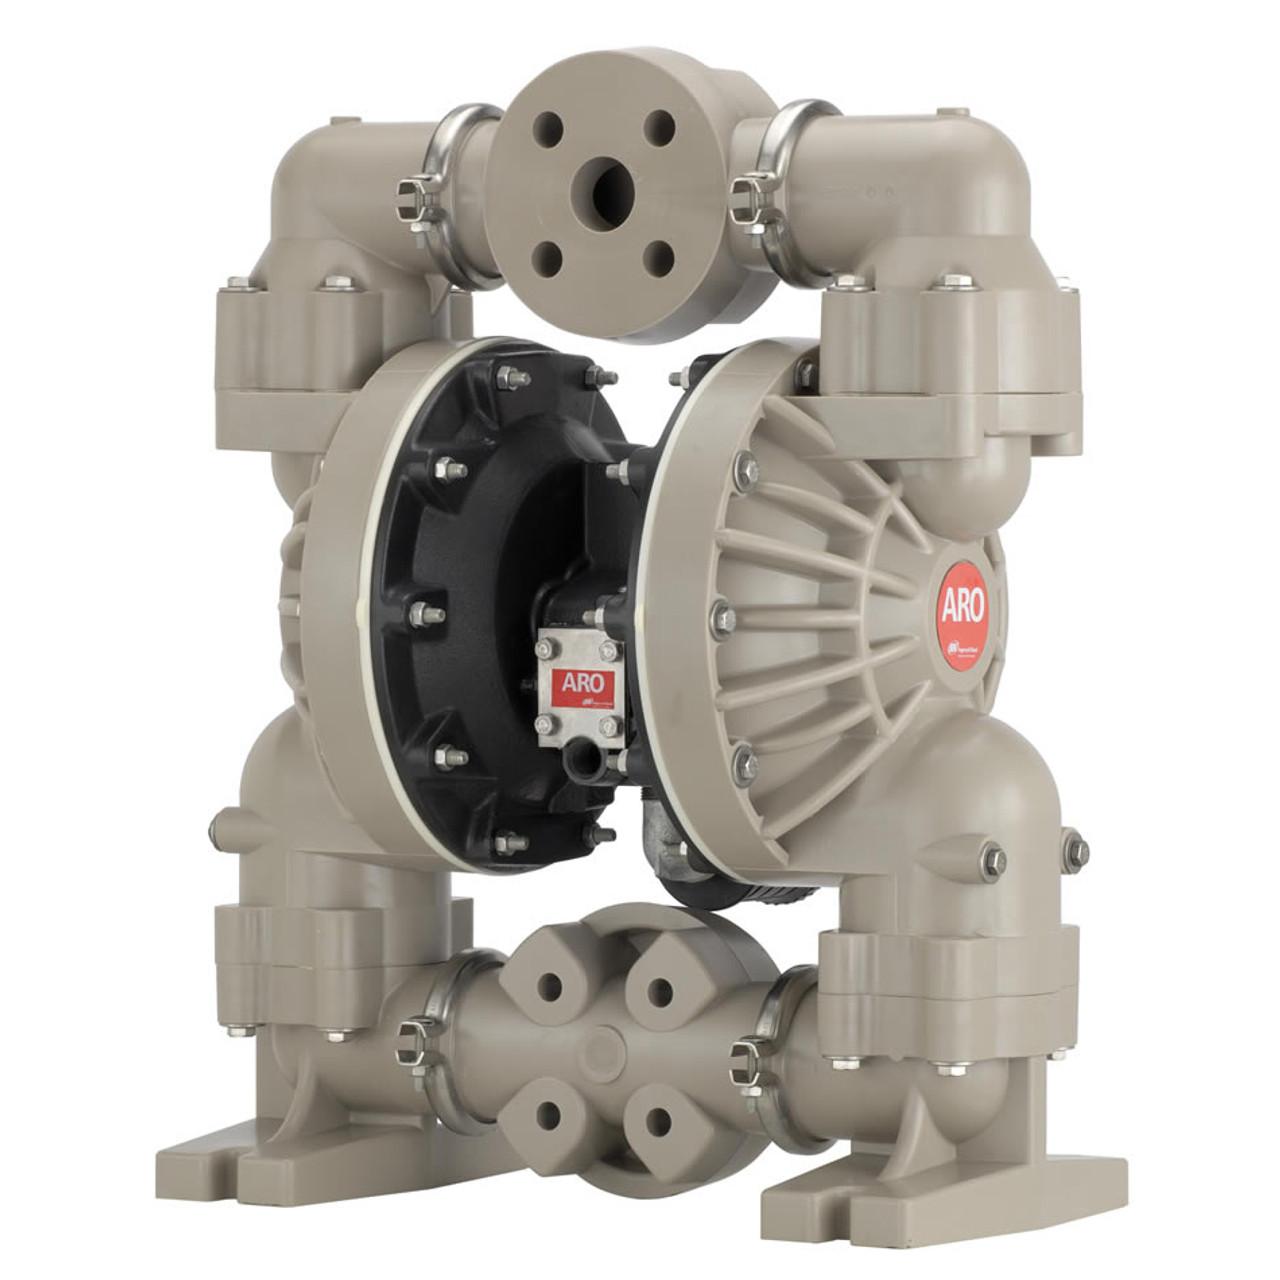 Aro pro series 1 12 in pvdf non metallic air operated diaphragm aro pro series 1 12 in pvdf non metallic air operated diaphragm pump john m ellsworth co inc ccuart Choice Image